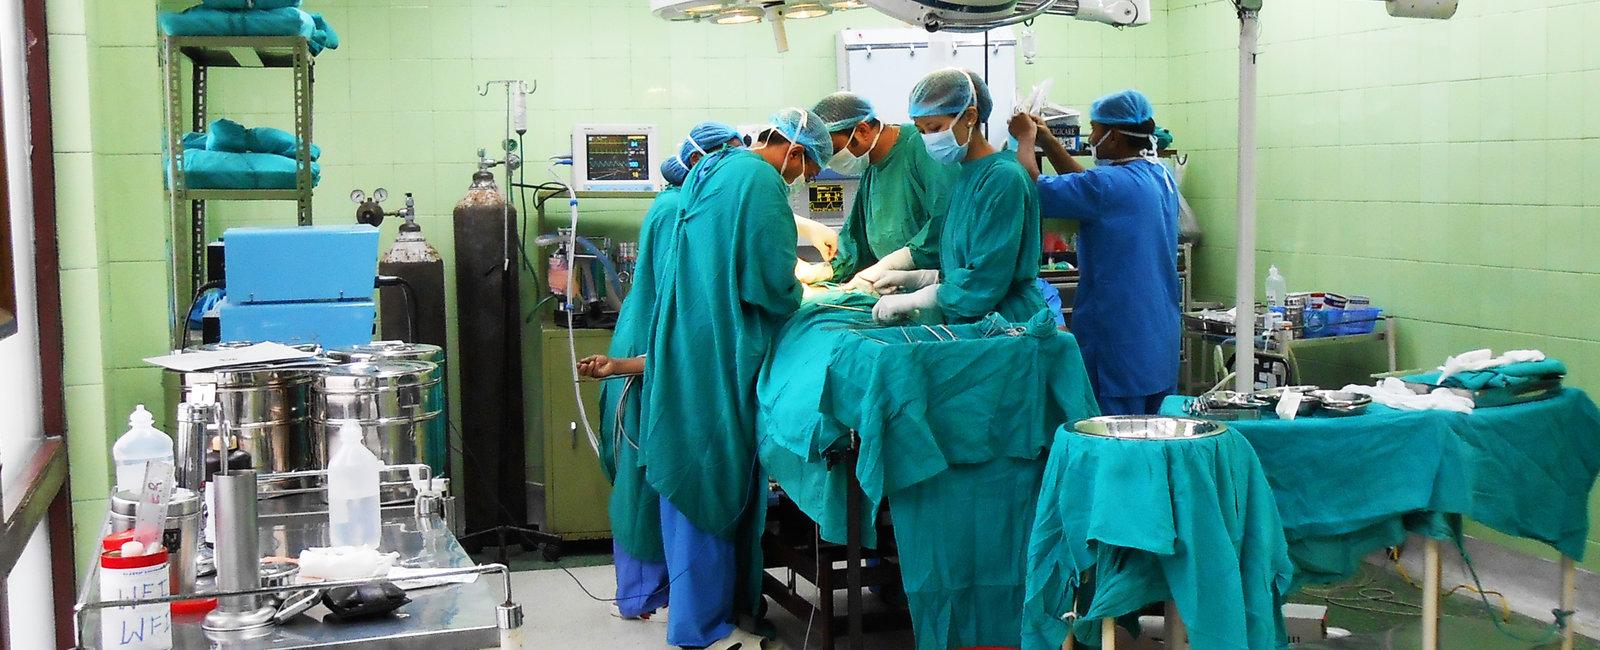 Surgical team in Kathmandu